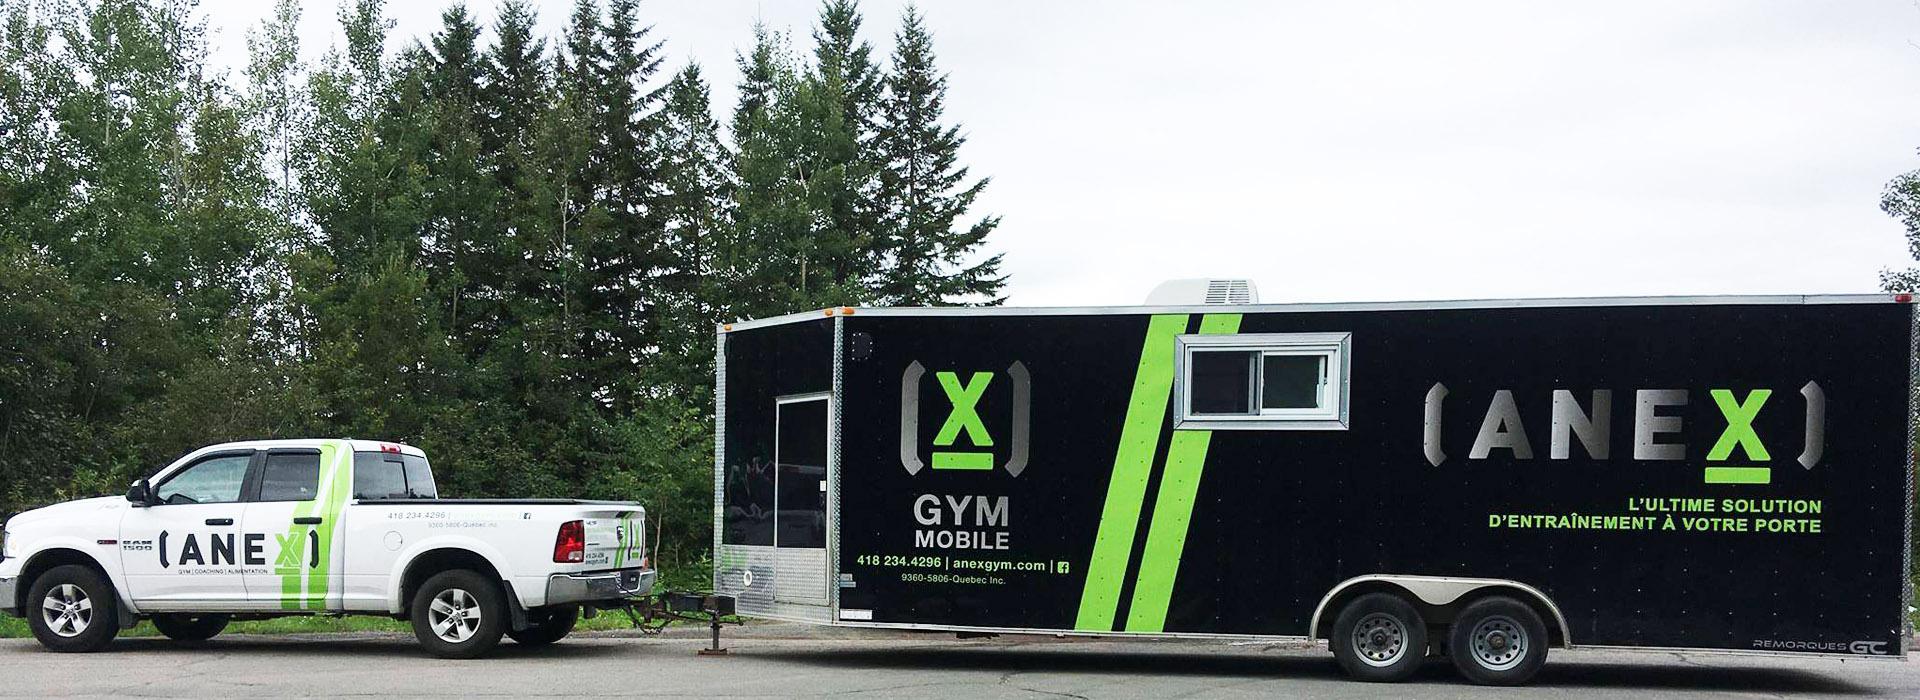 Entraîneur privé Pascal Deschamps| Gym Mobile | Anex Gym